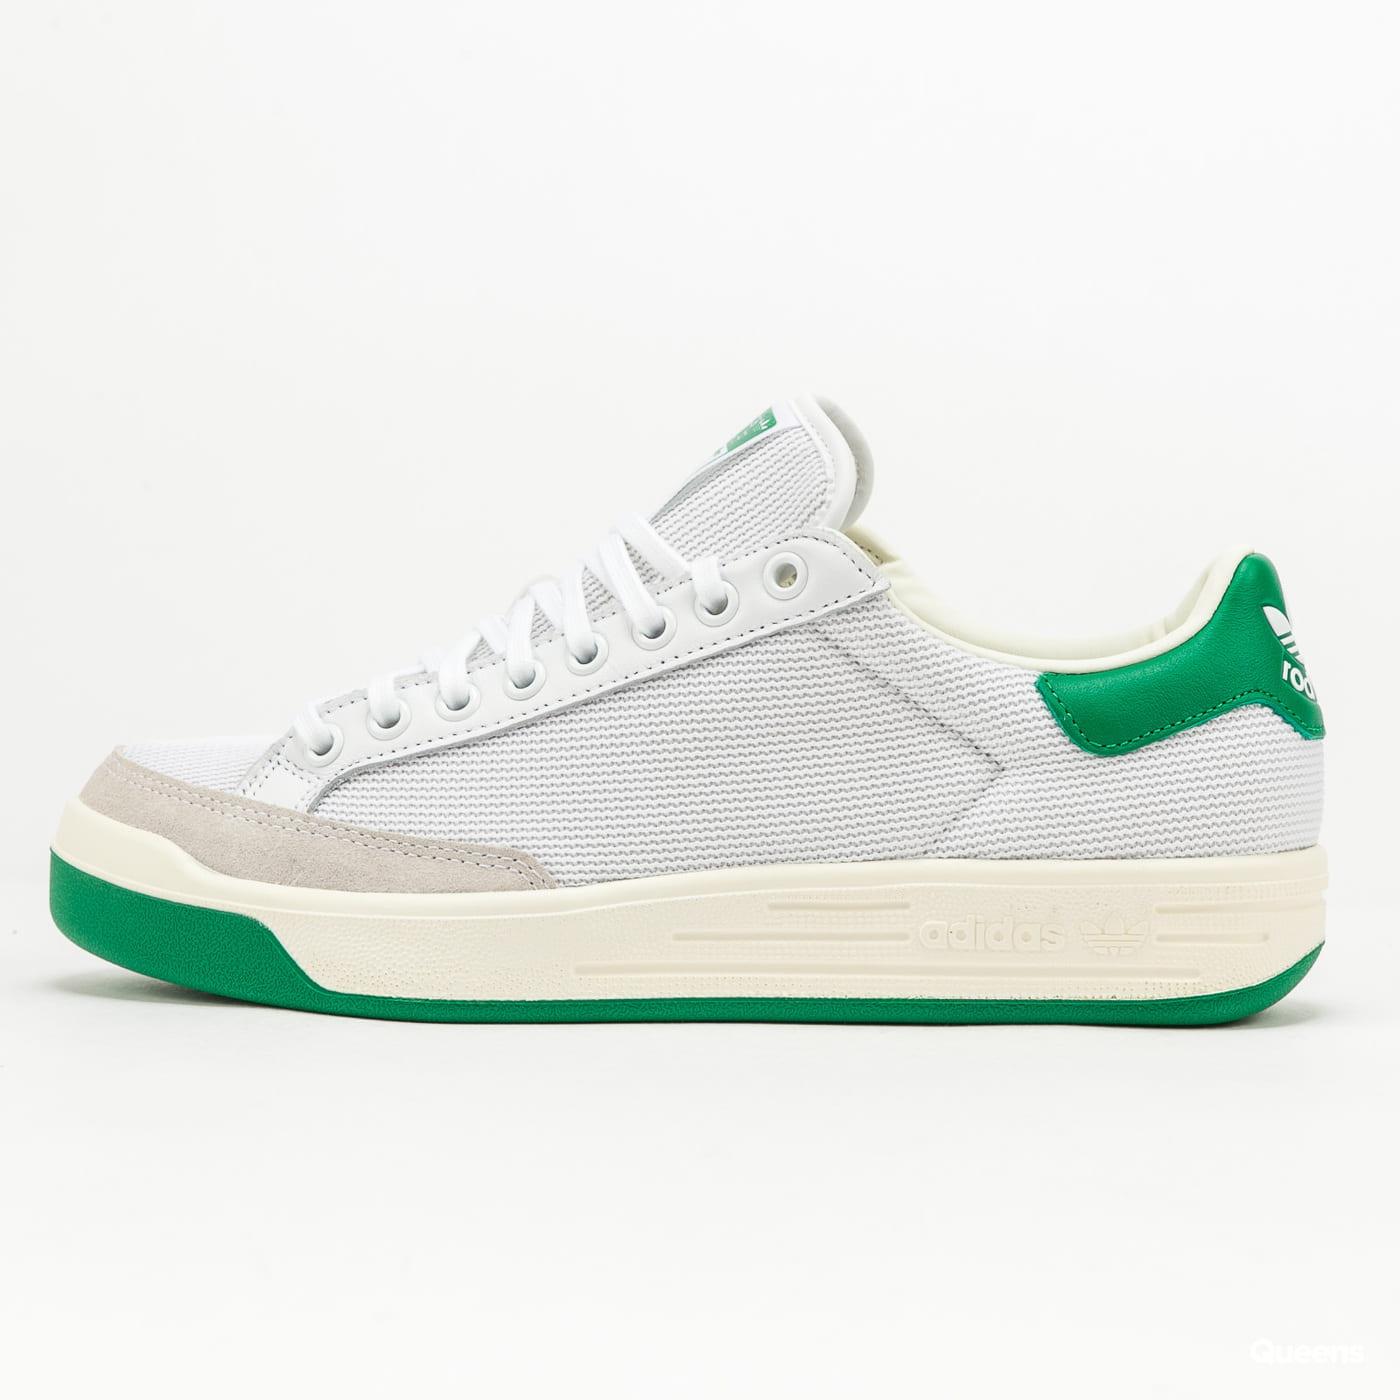 adidas Originals Rod Laver ftwwht / green / owhite